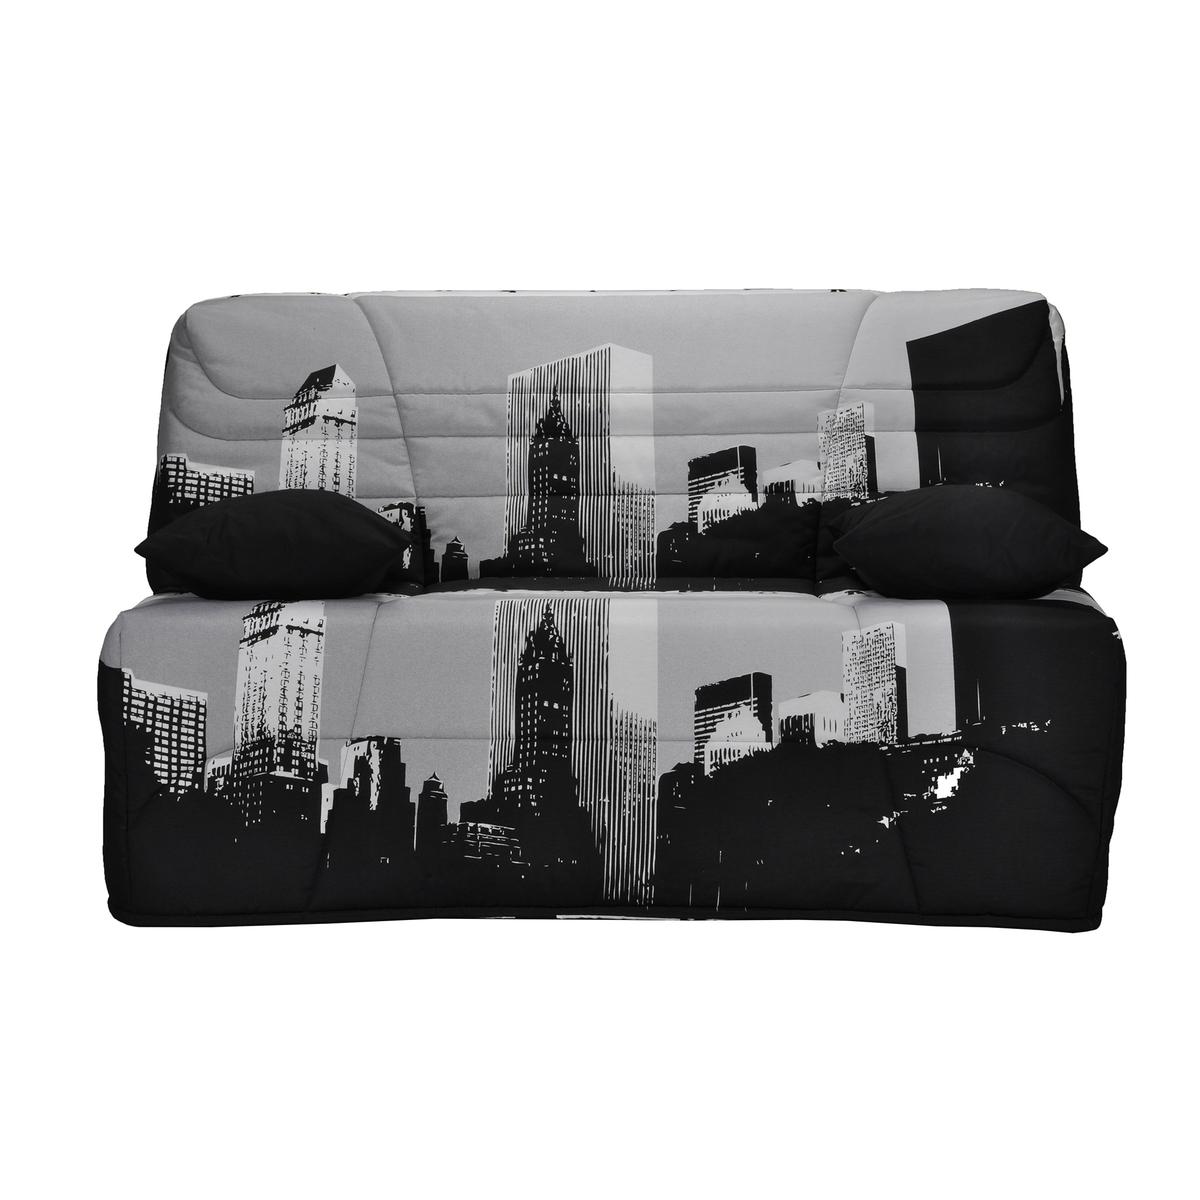 Чехол LaRedoute Для дивана-книжки BZ матрас 15 см 250 гм 90 x 190 см черный